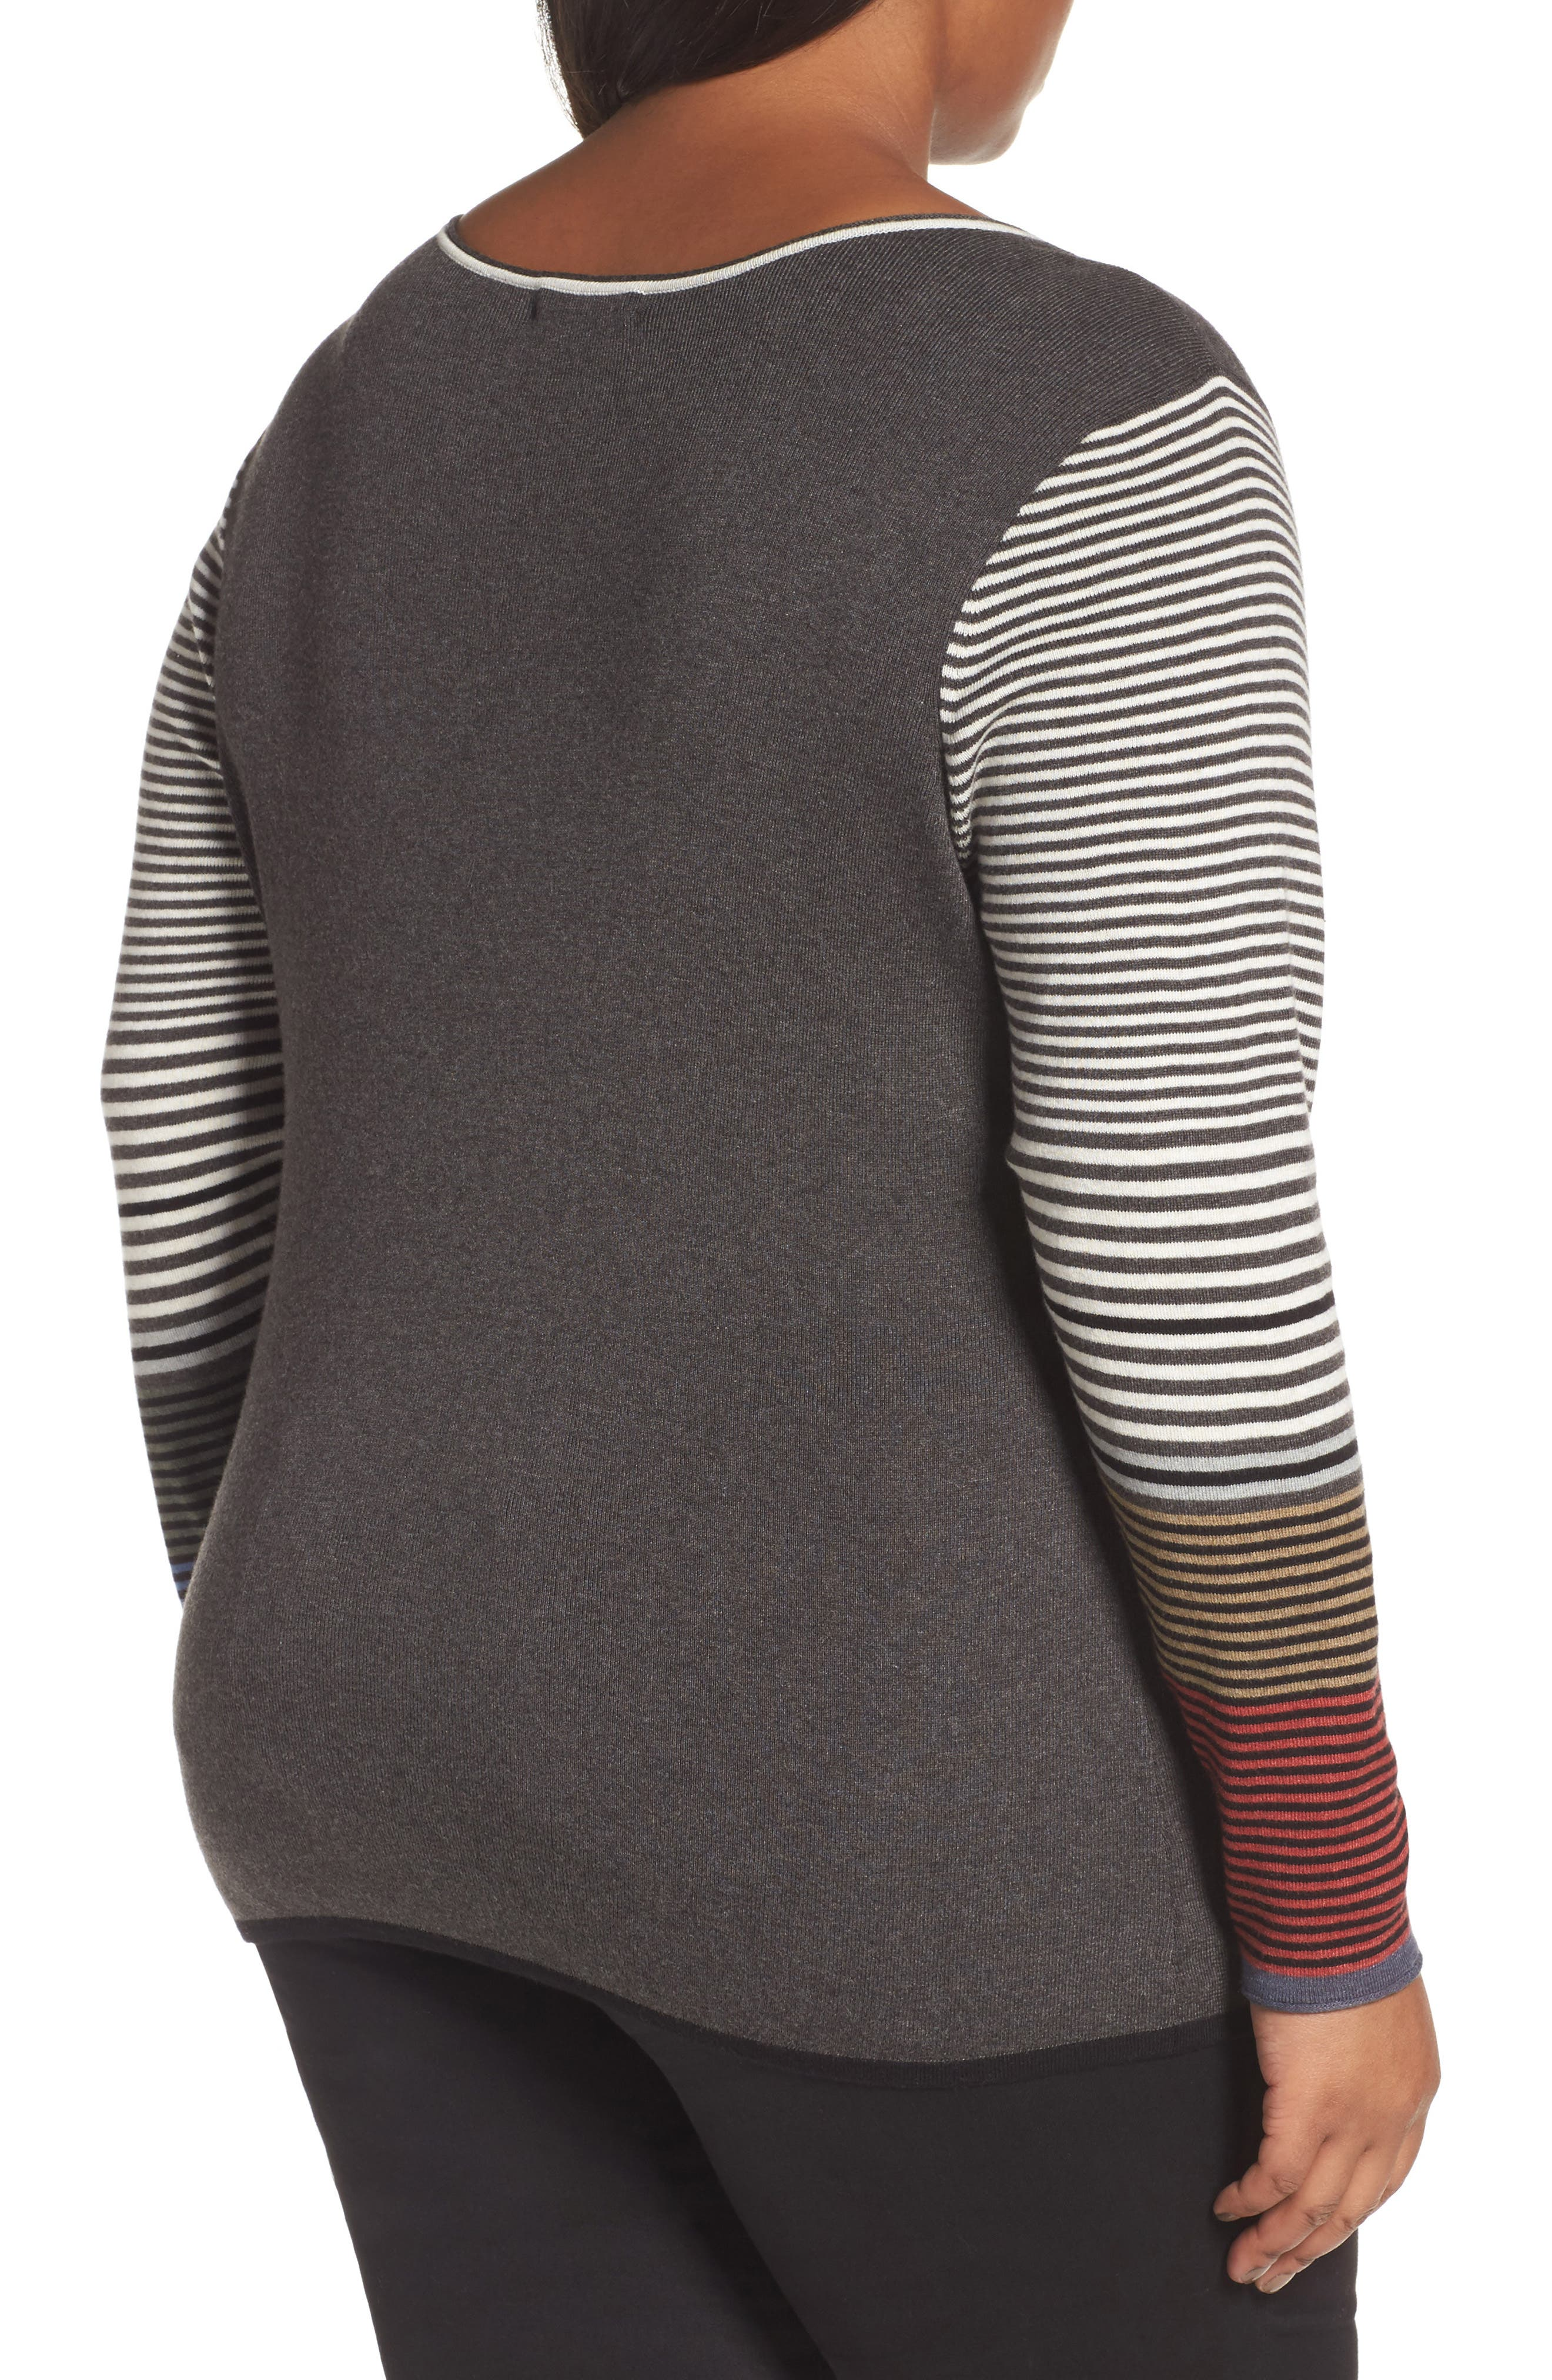 Metro Stripe Sweater,                             Alternate thumbnail 2, color,                             020